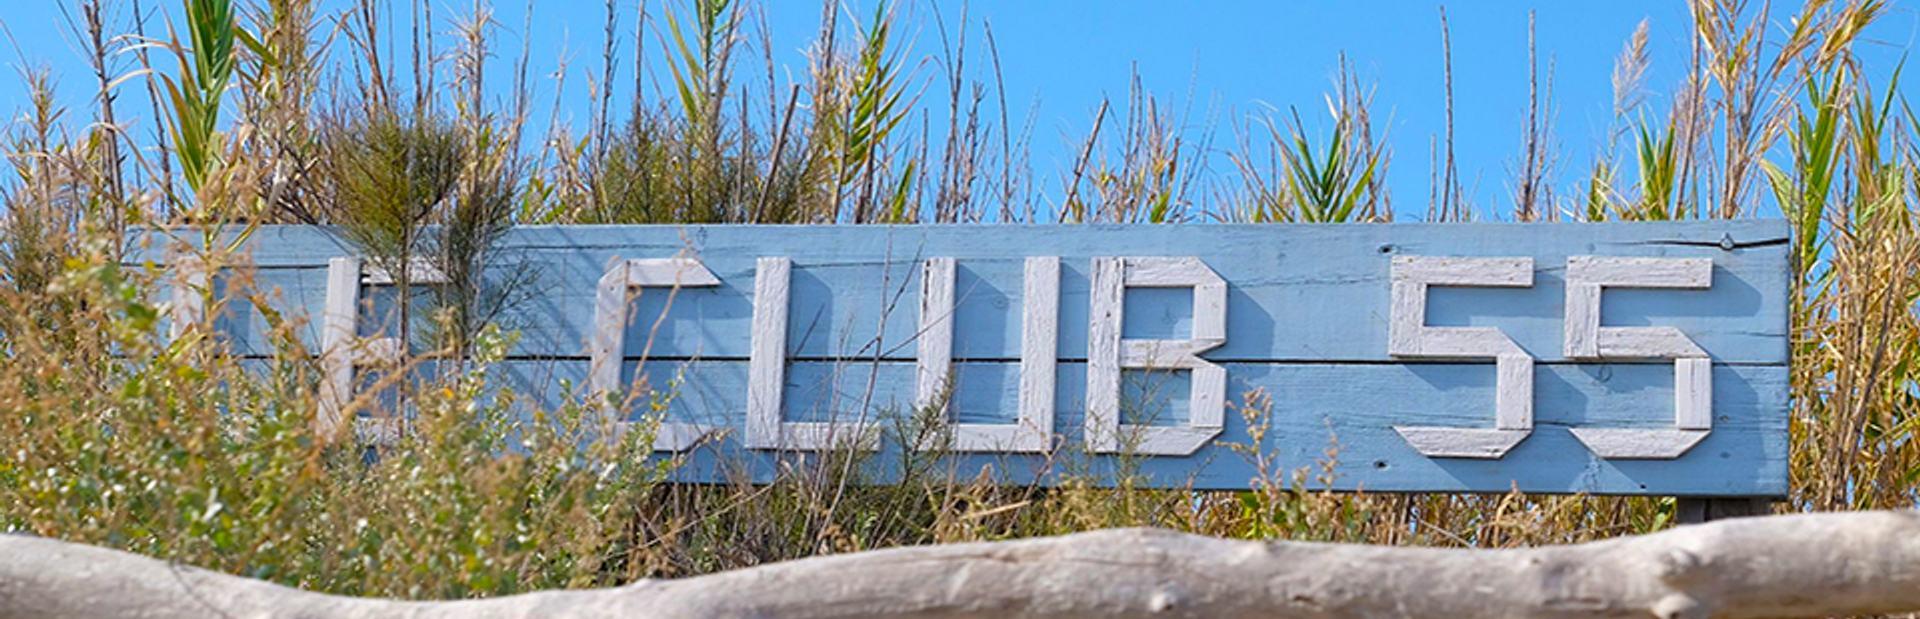 Club 55 Image 1